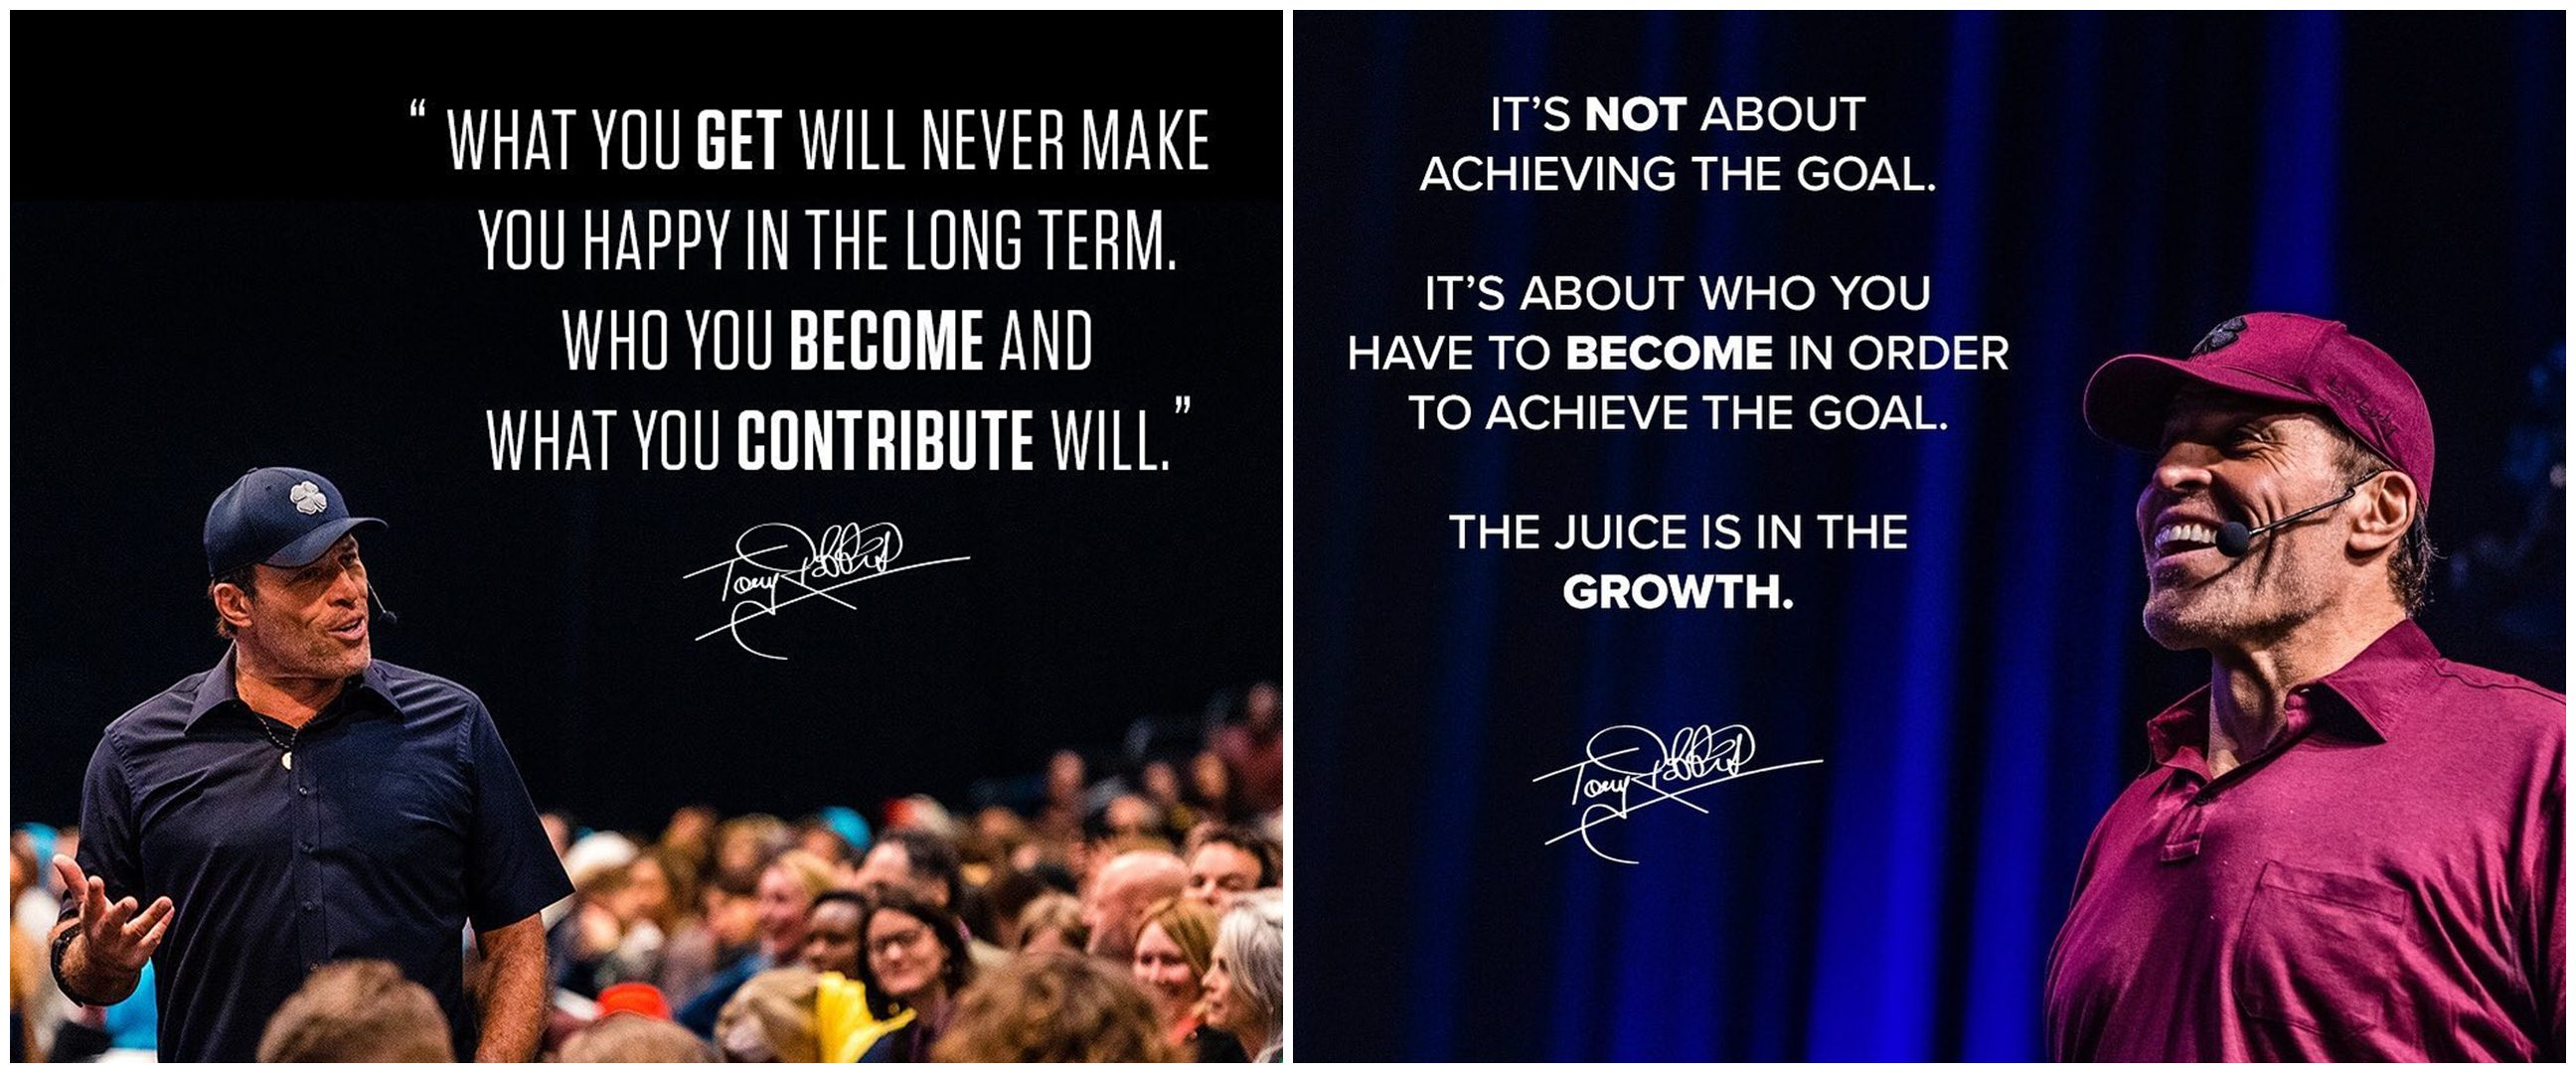 40 Kata-kata quote Tony Robbins tentang kehidupan, inspiratif